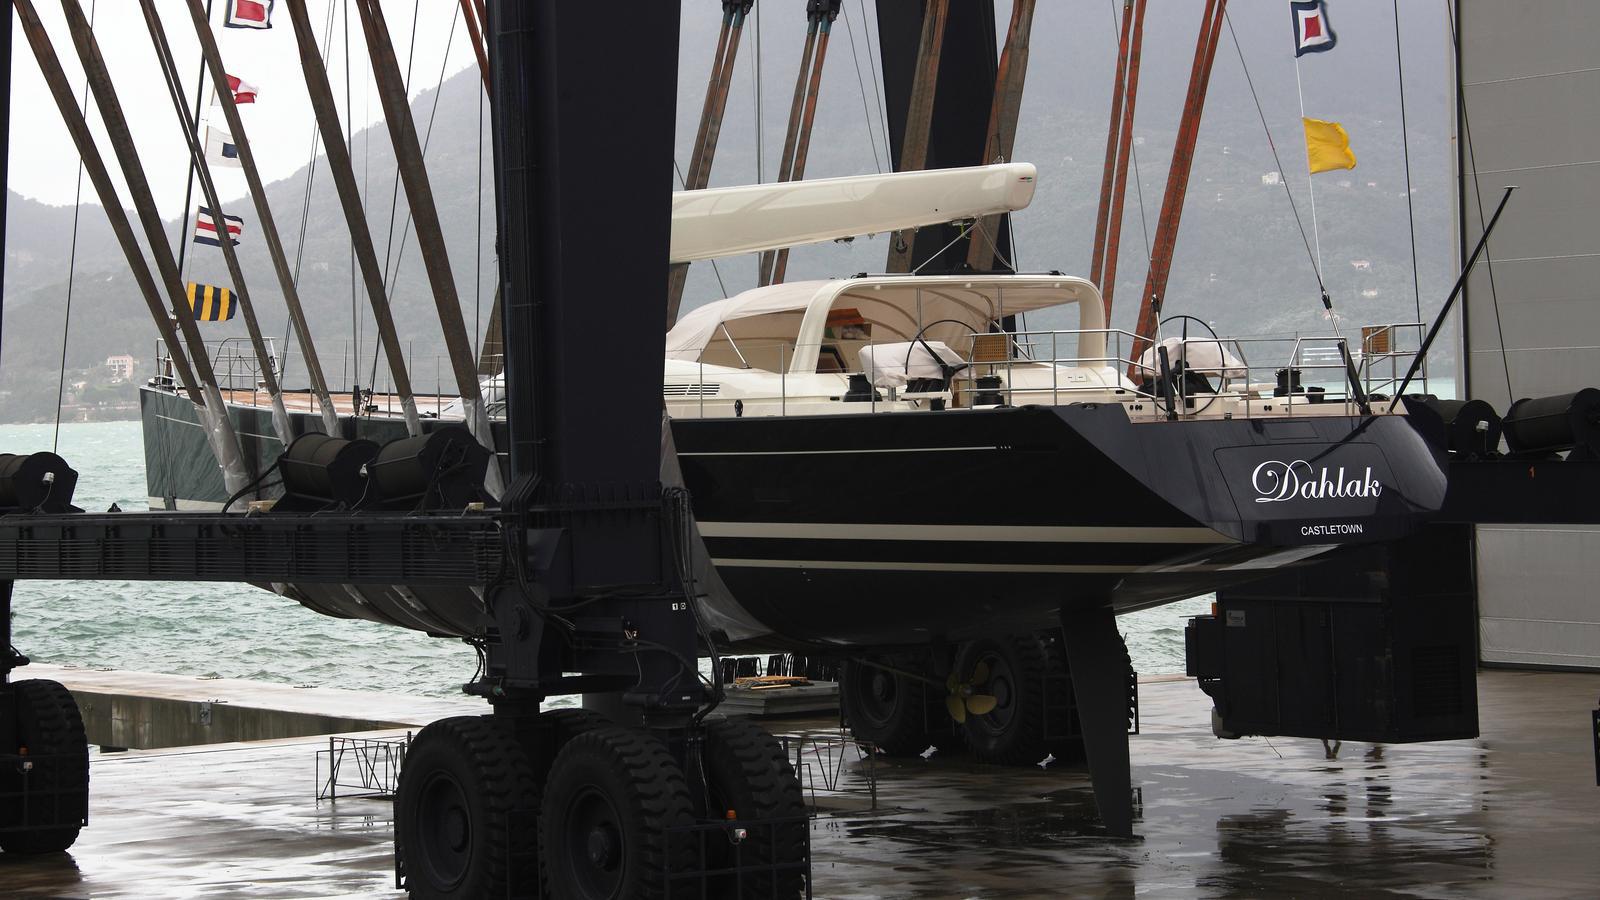 38-metre-Perini-Navi-sloop-Dahlak-is-launched